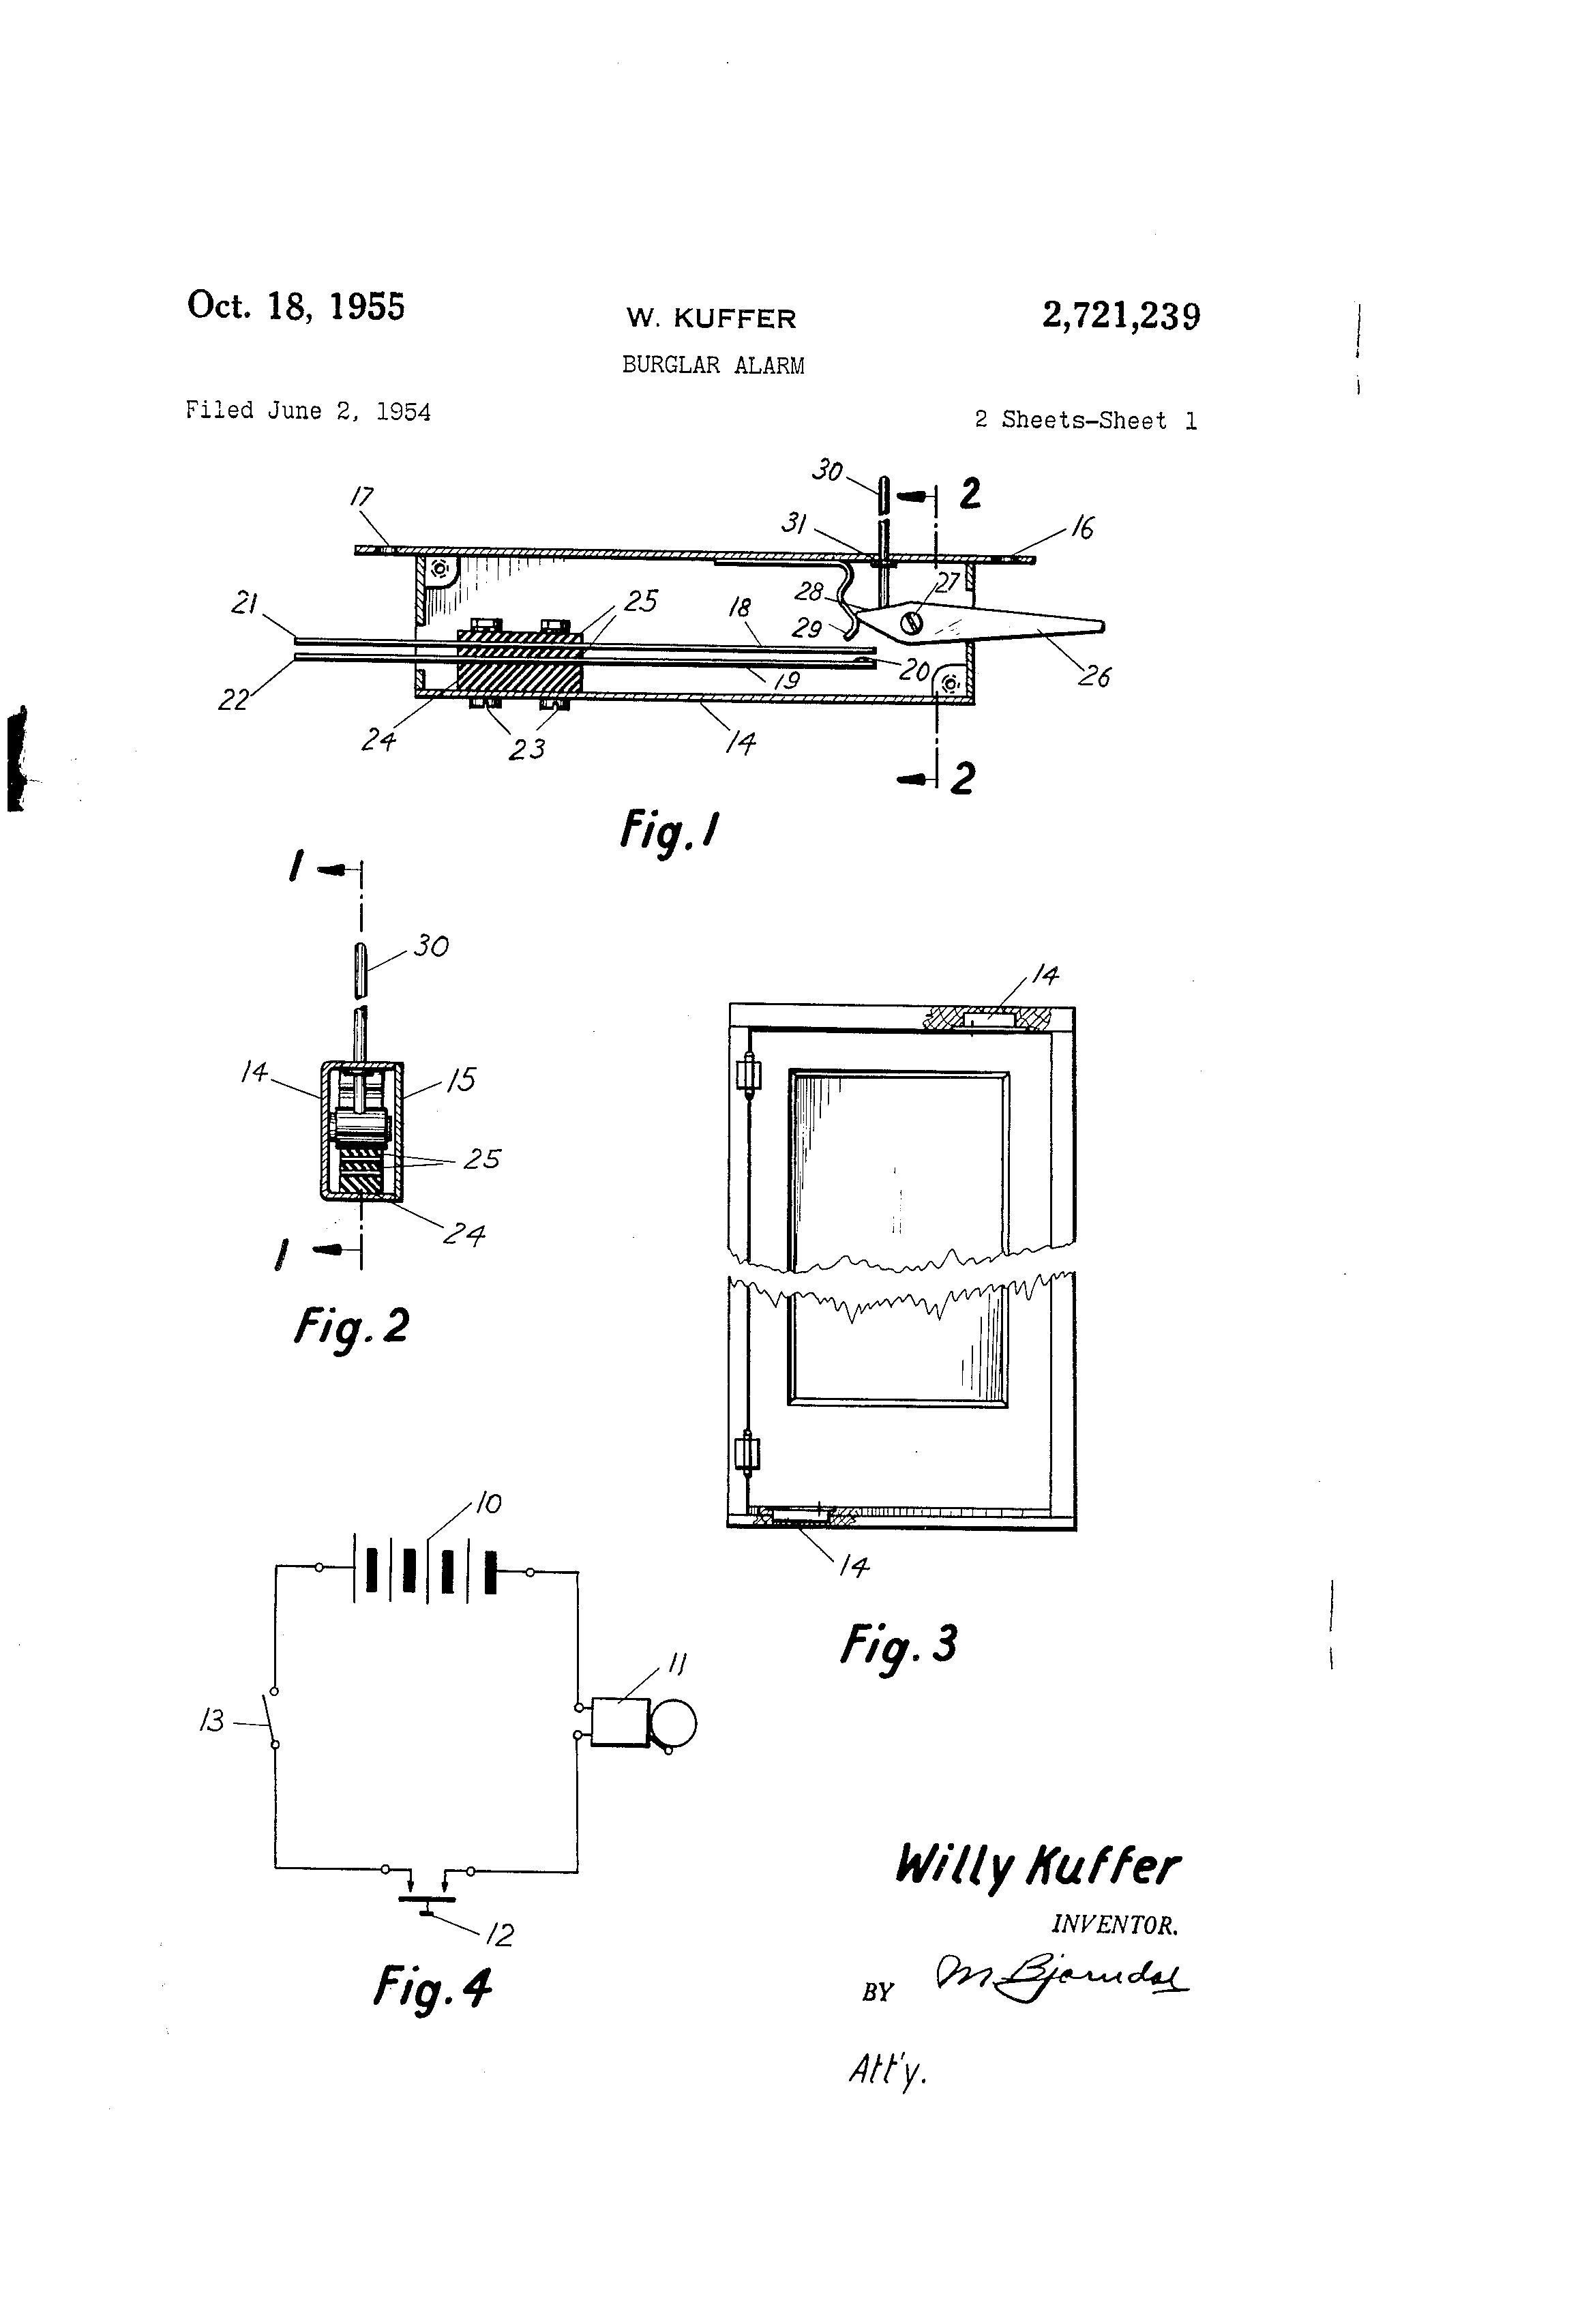 simon xt alarm system wiring diagram get free image about wiring diagram